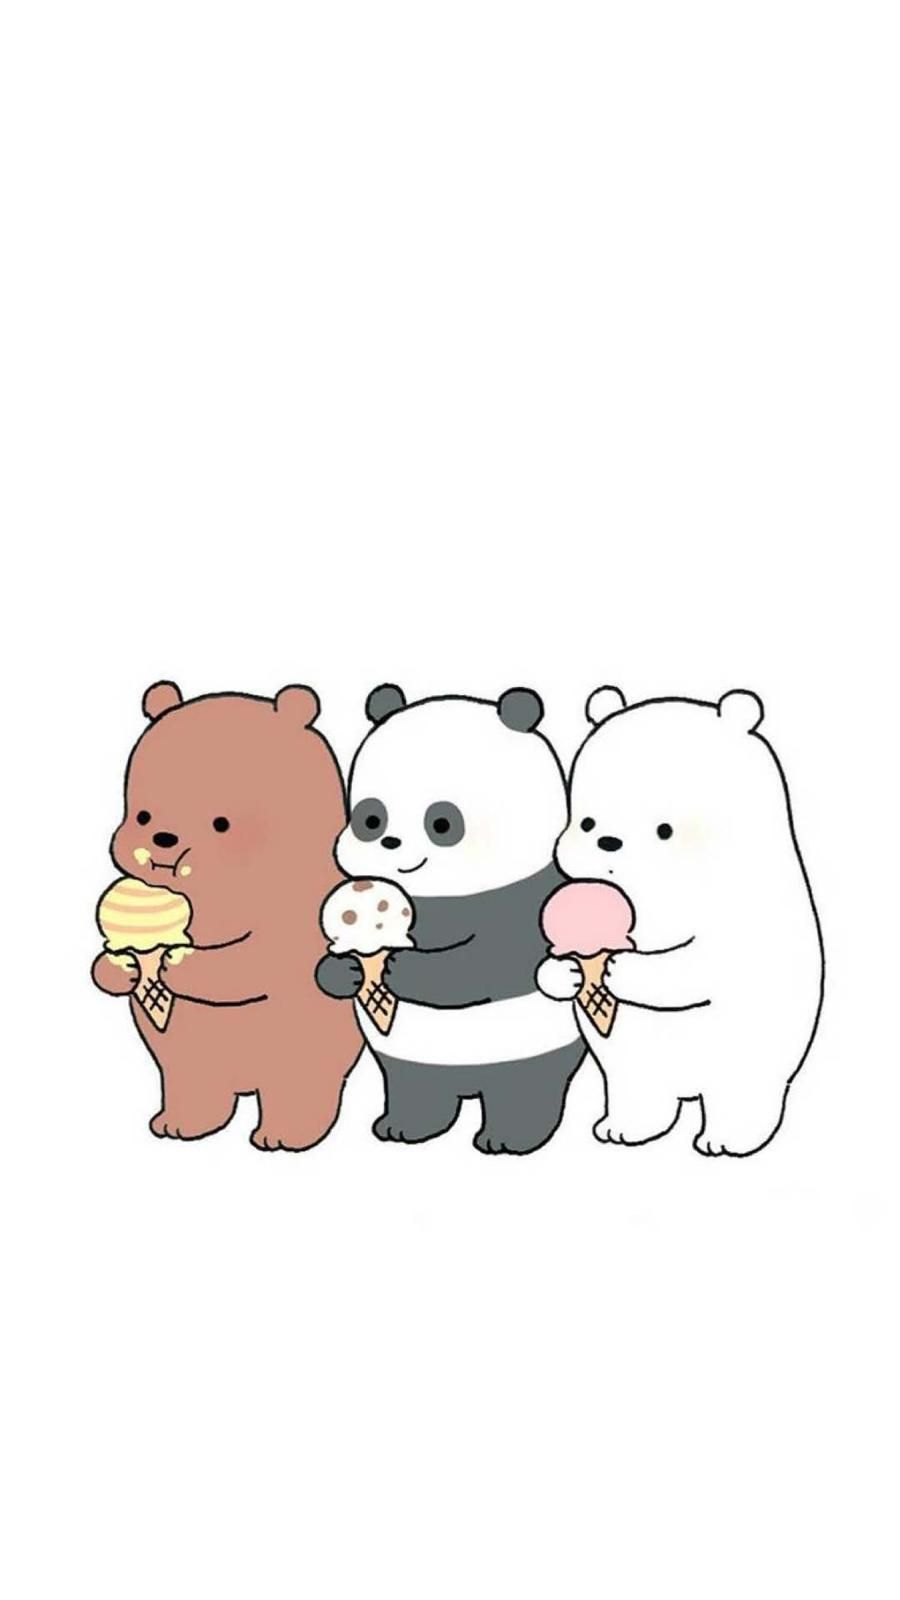 Pin Oleh Danat Di We Bare Bears Boneka Hewan Kartun Anak Binatang